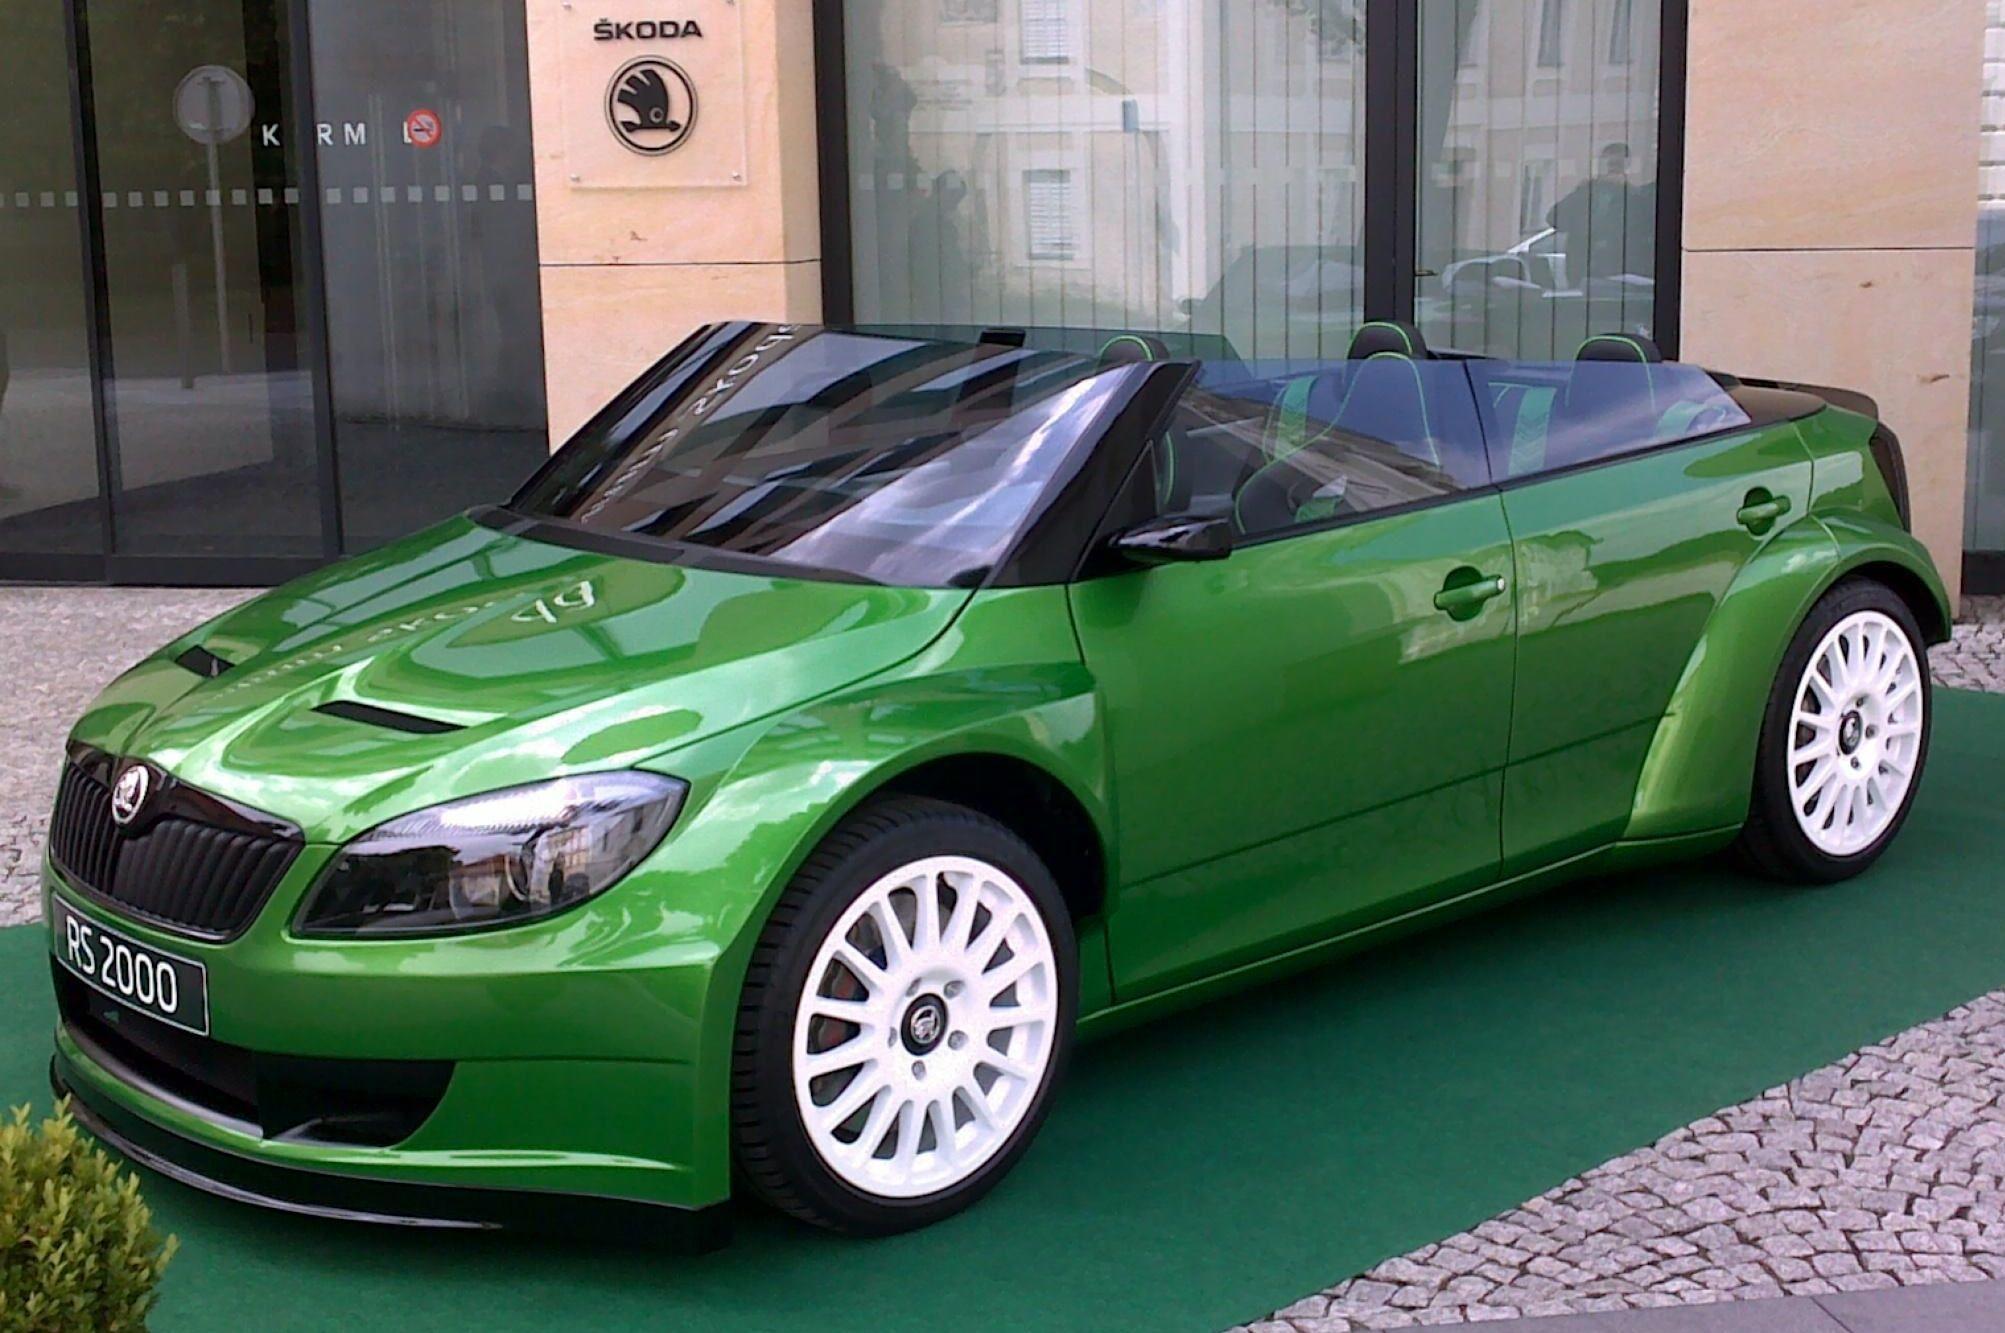 Skoda Fabia Rs 2000 Motor Autok